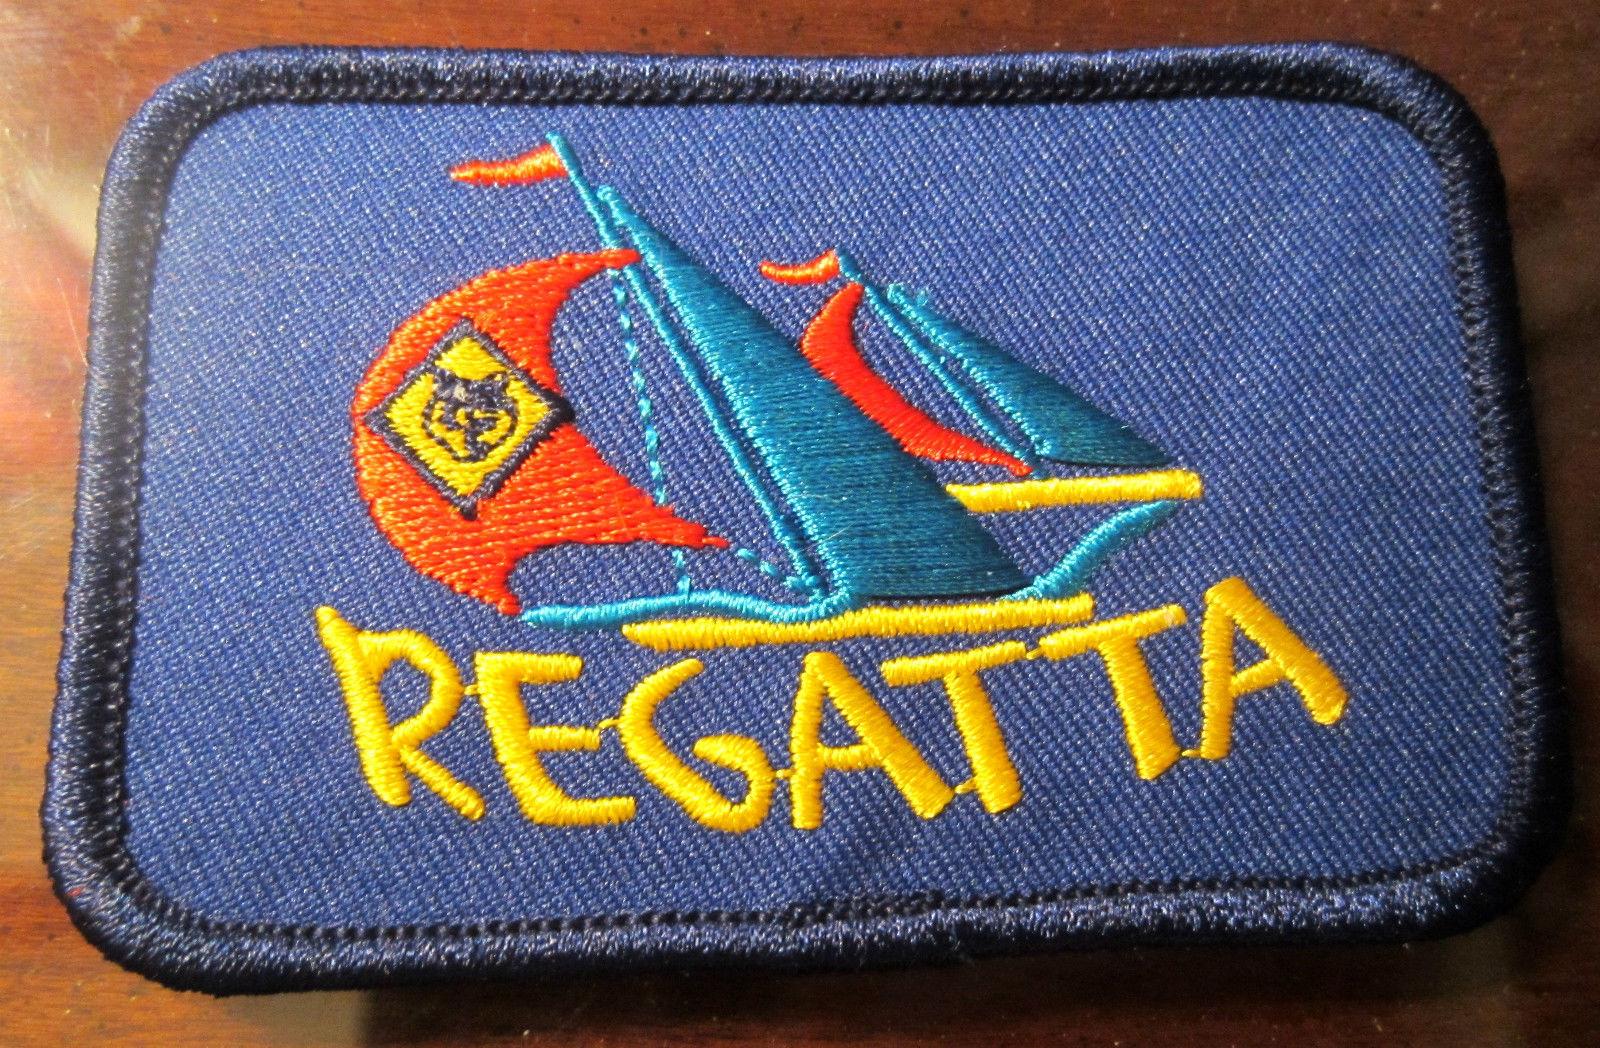 Uniform Patch Boy Scout Bsa Network Cub Scout Regatta Sail